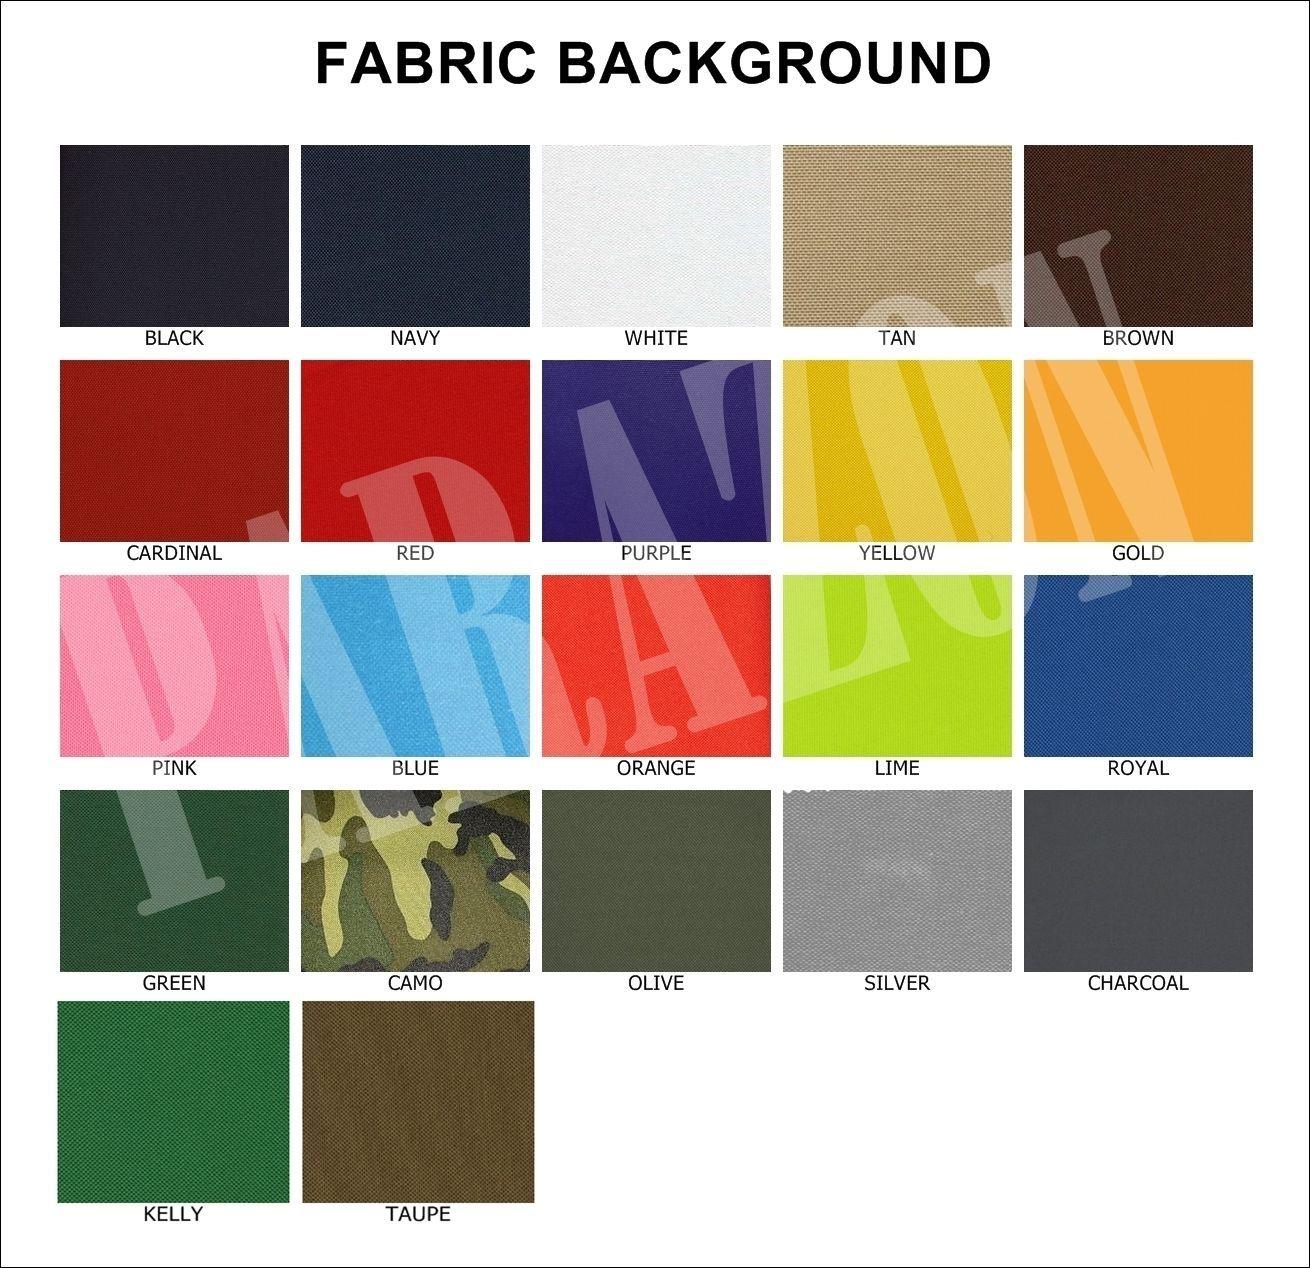 "Custom Embroidery Rockers Ribbon, Name & MC Biker Set Sew on Patch 11"" (E-2)-4PC"